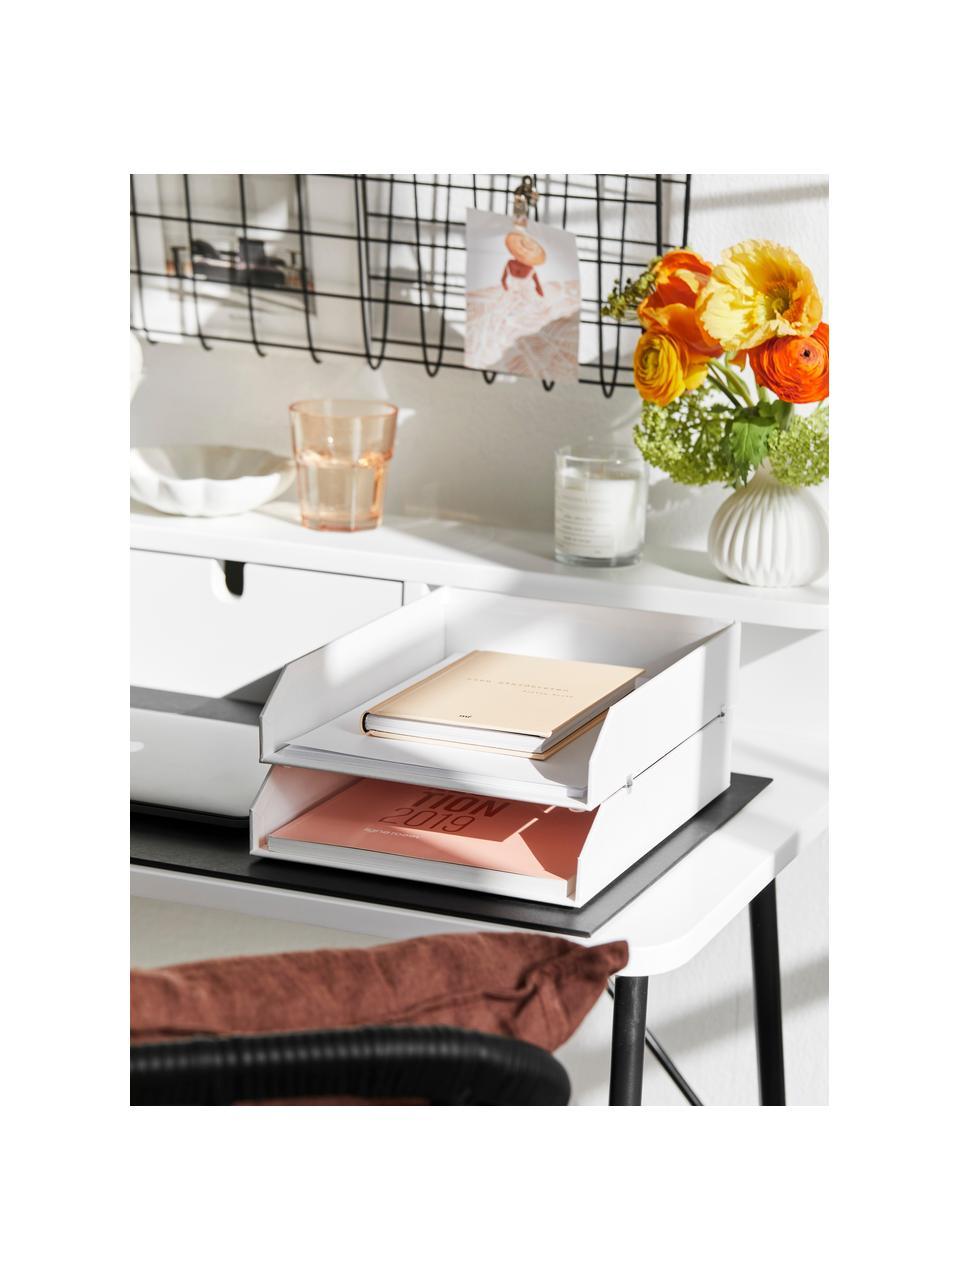 Dokumenten-Ablagen Hakan, 2 Stück, Fester, laminierter Karton, Weiß, B 23 x T 31 cm